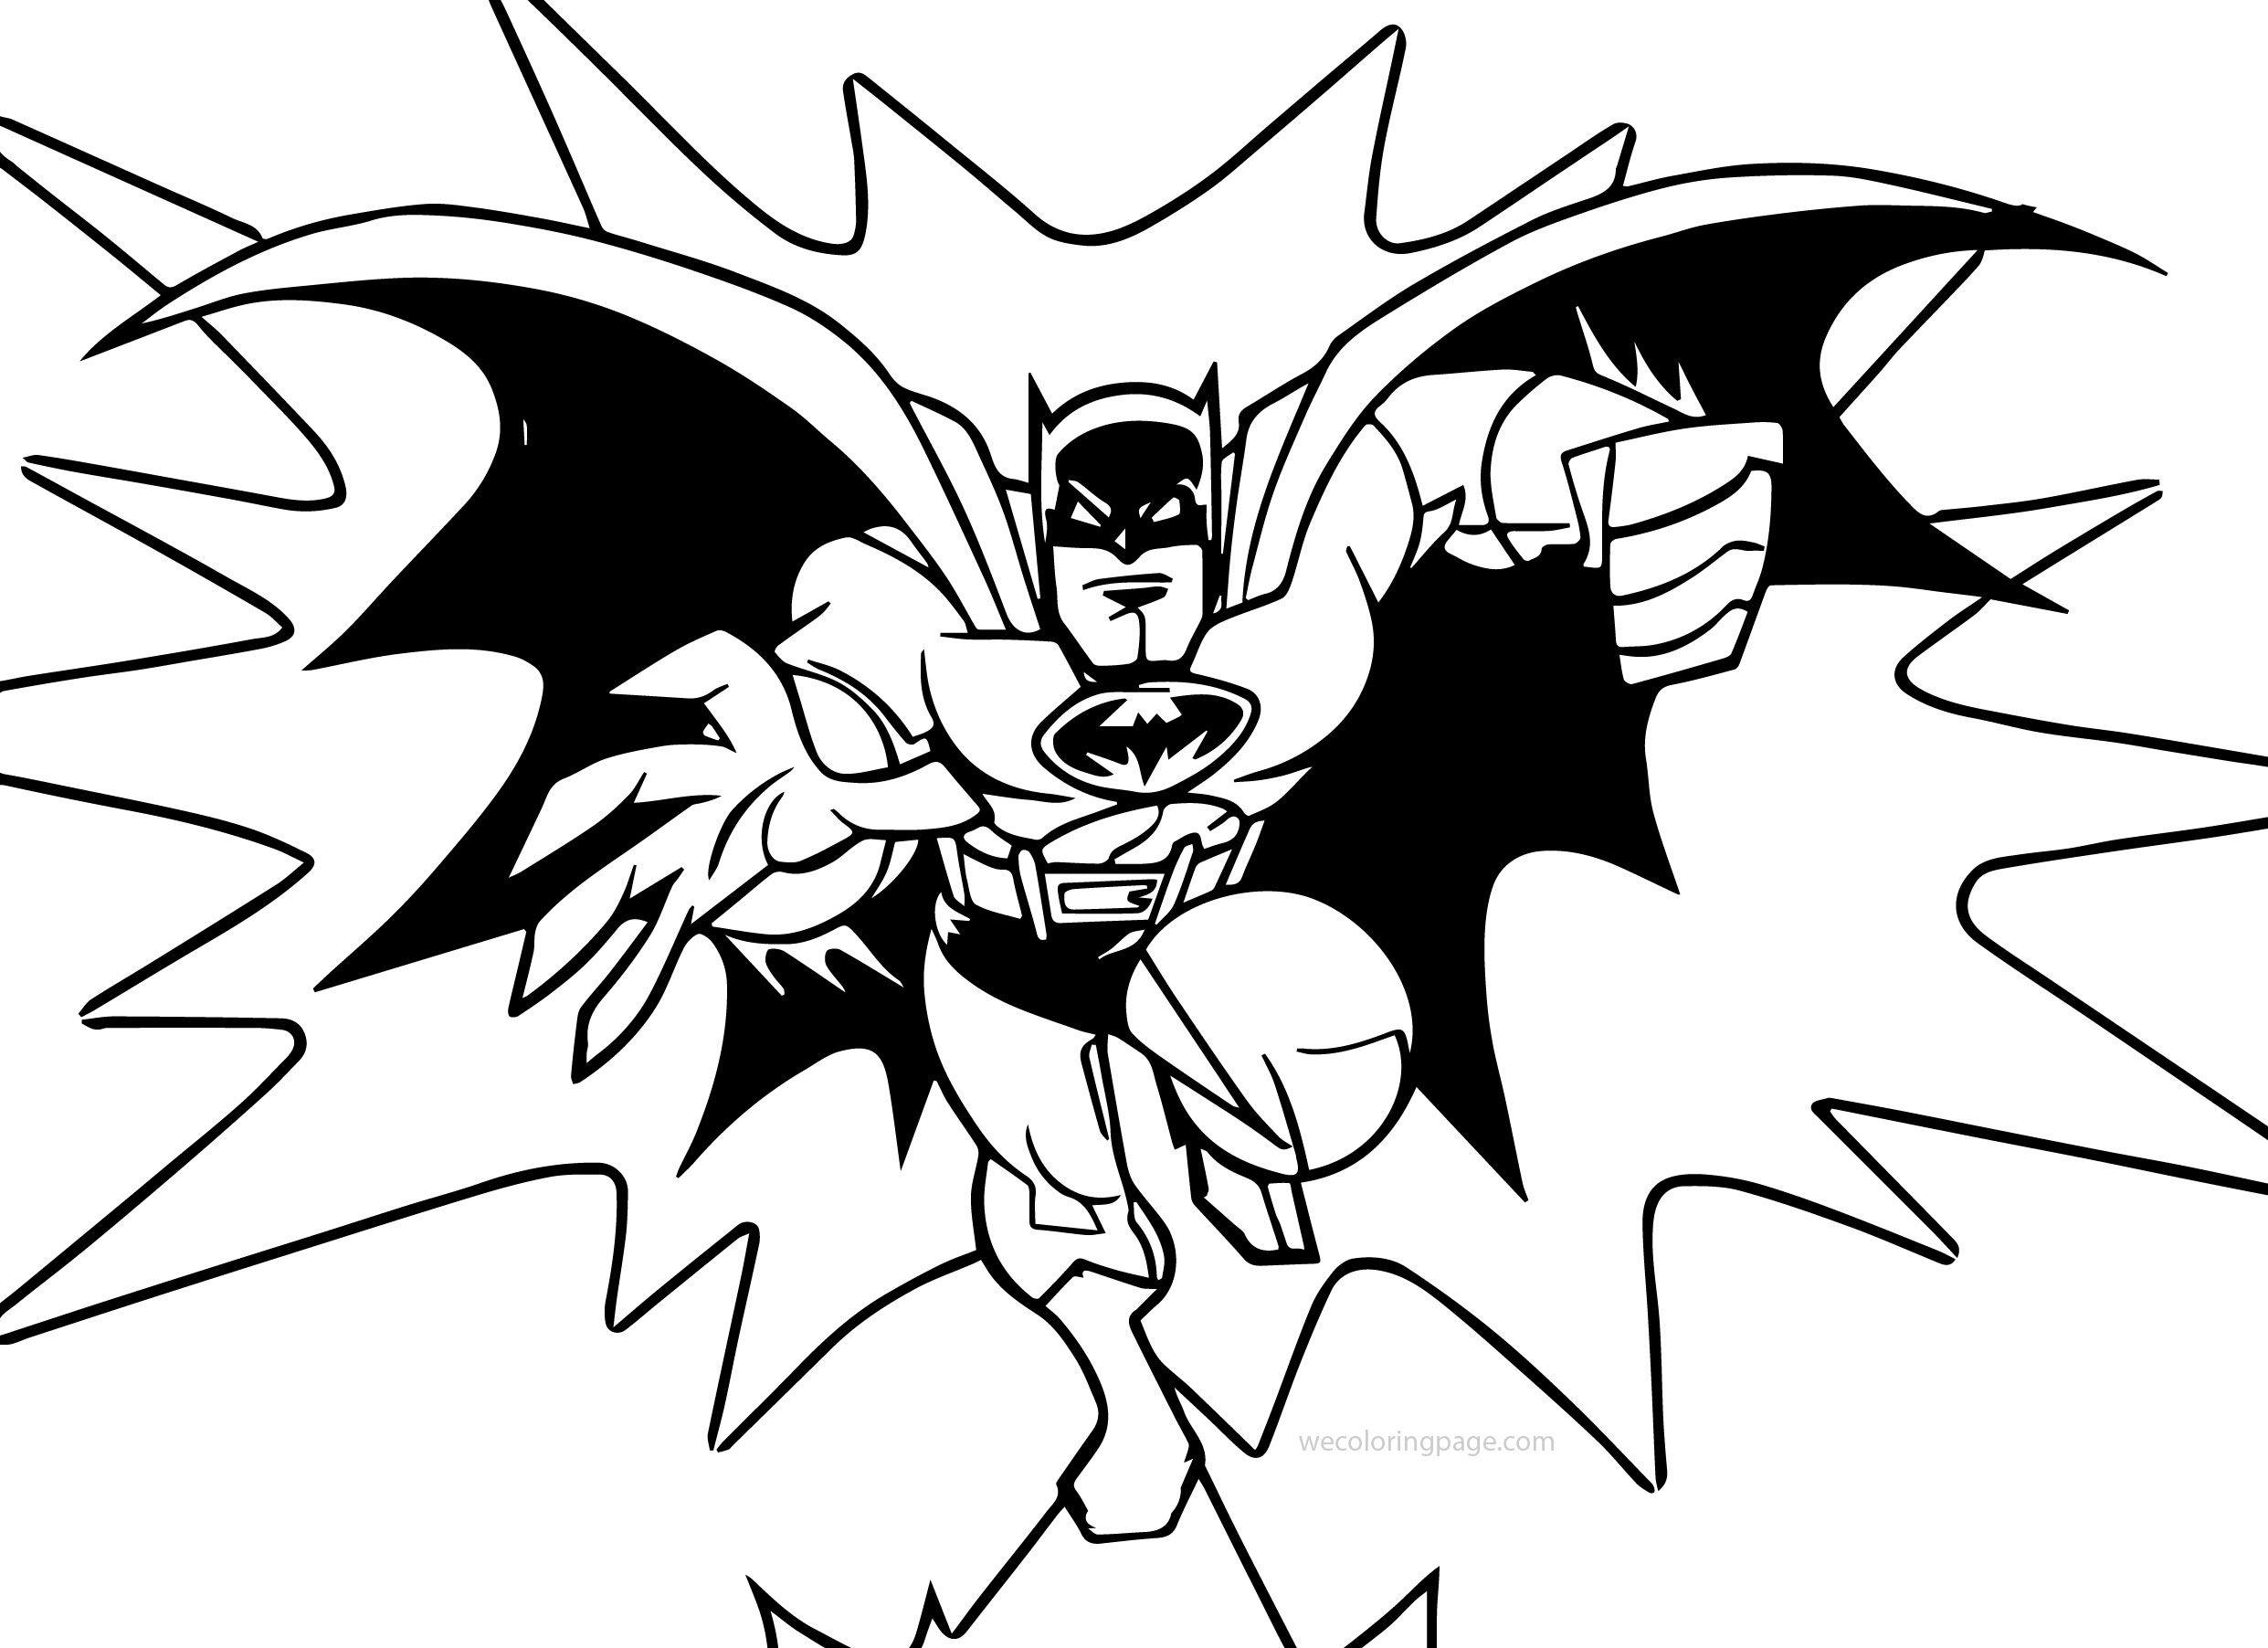 Batman Coloring Pages | Batman, Stenciling and Crafty